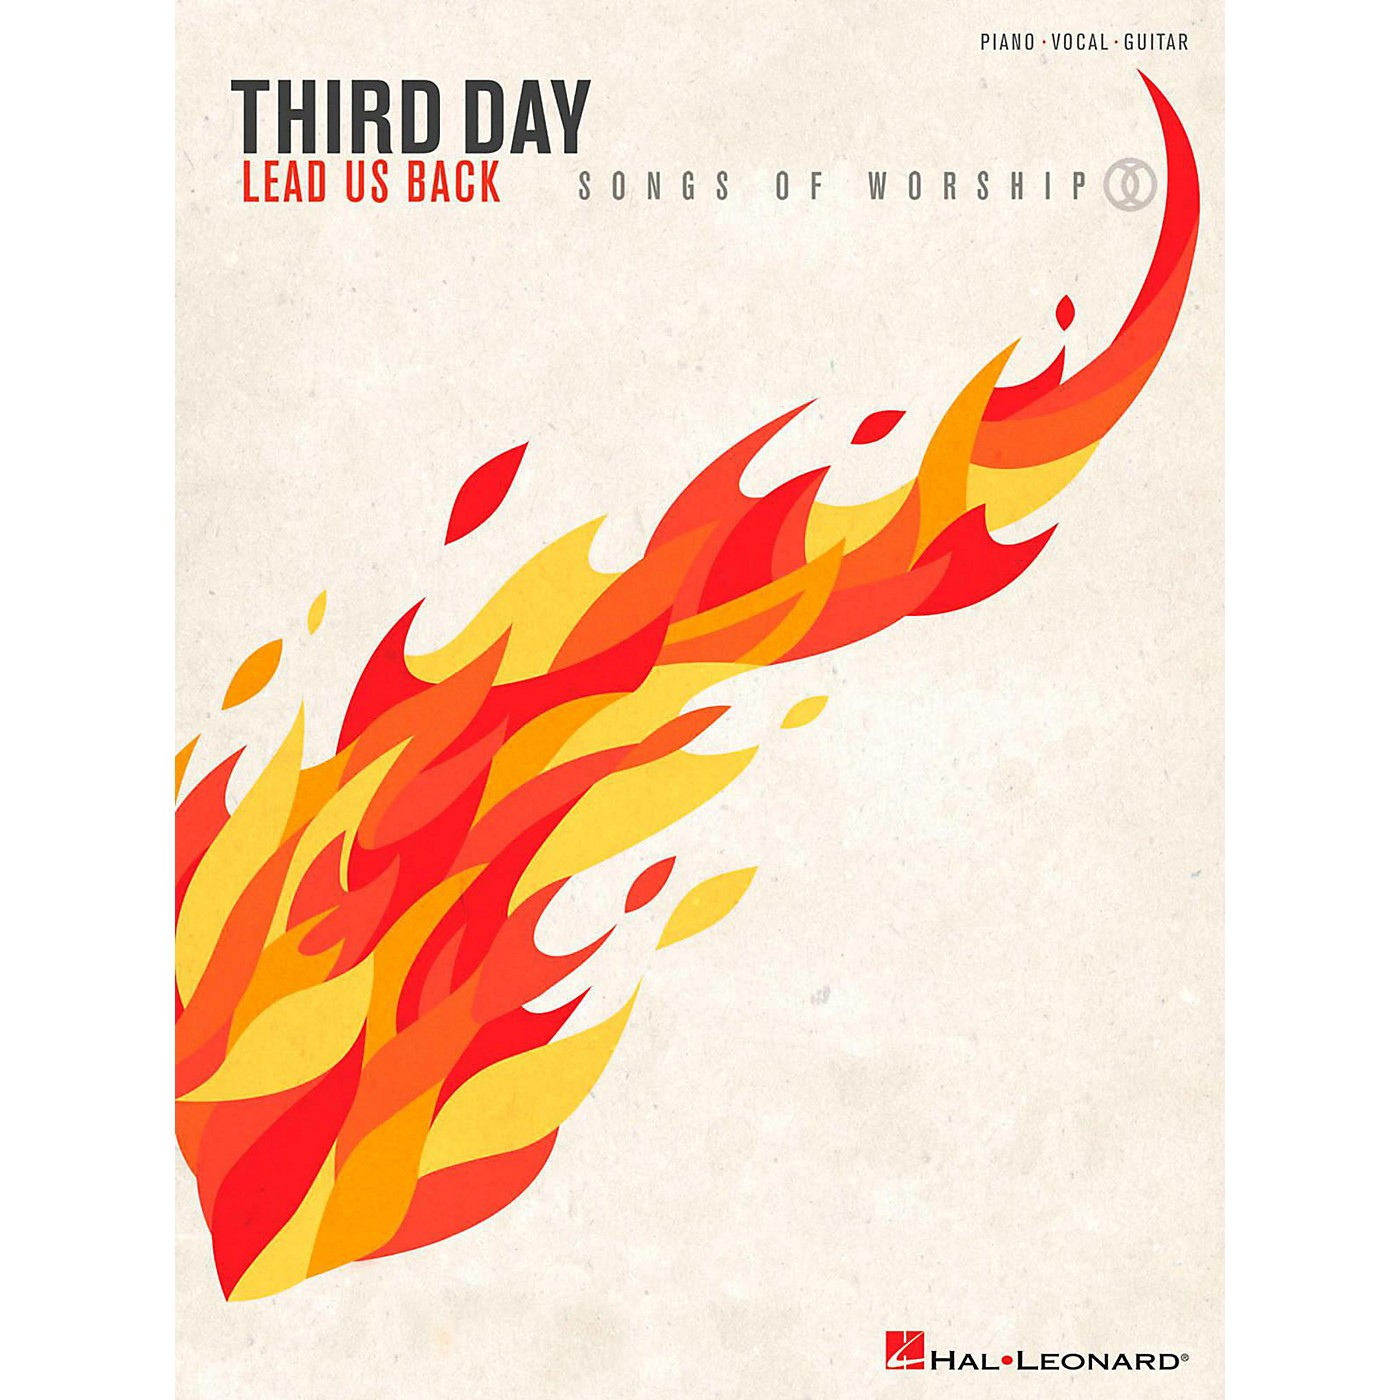 Hal Leonard Third Day - Lead Us Back: Songs Of Worship thumbnail